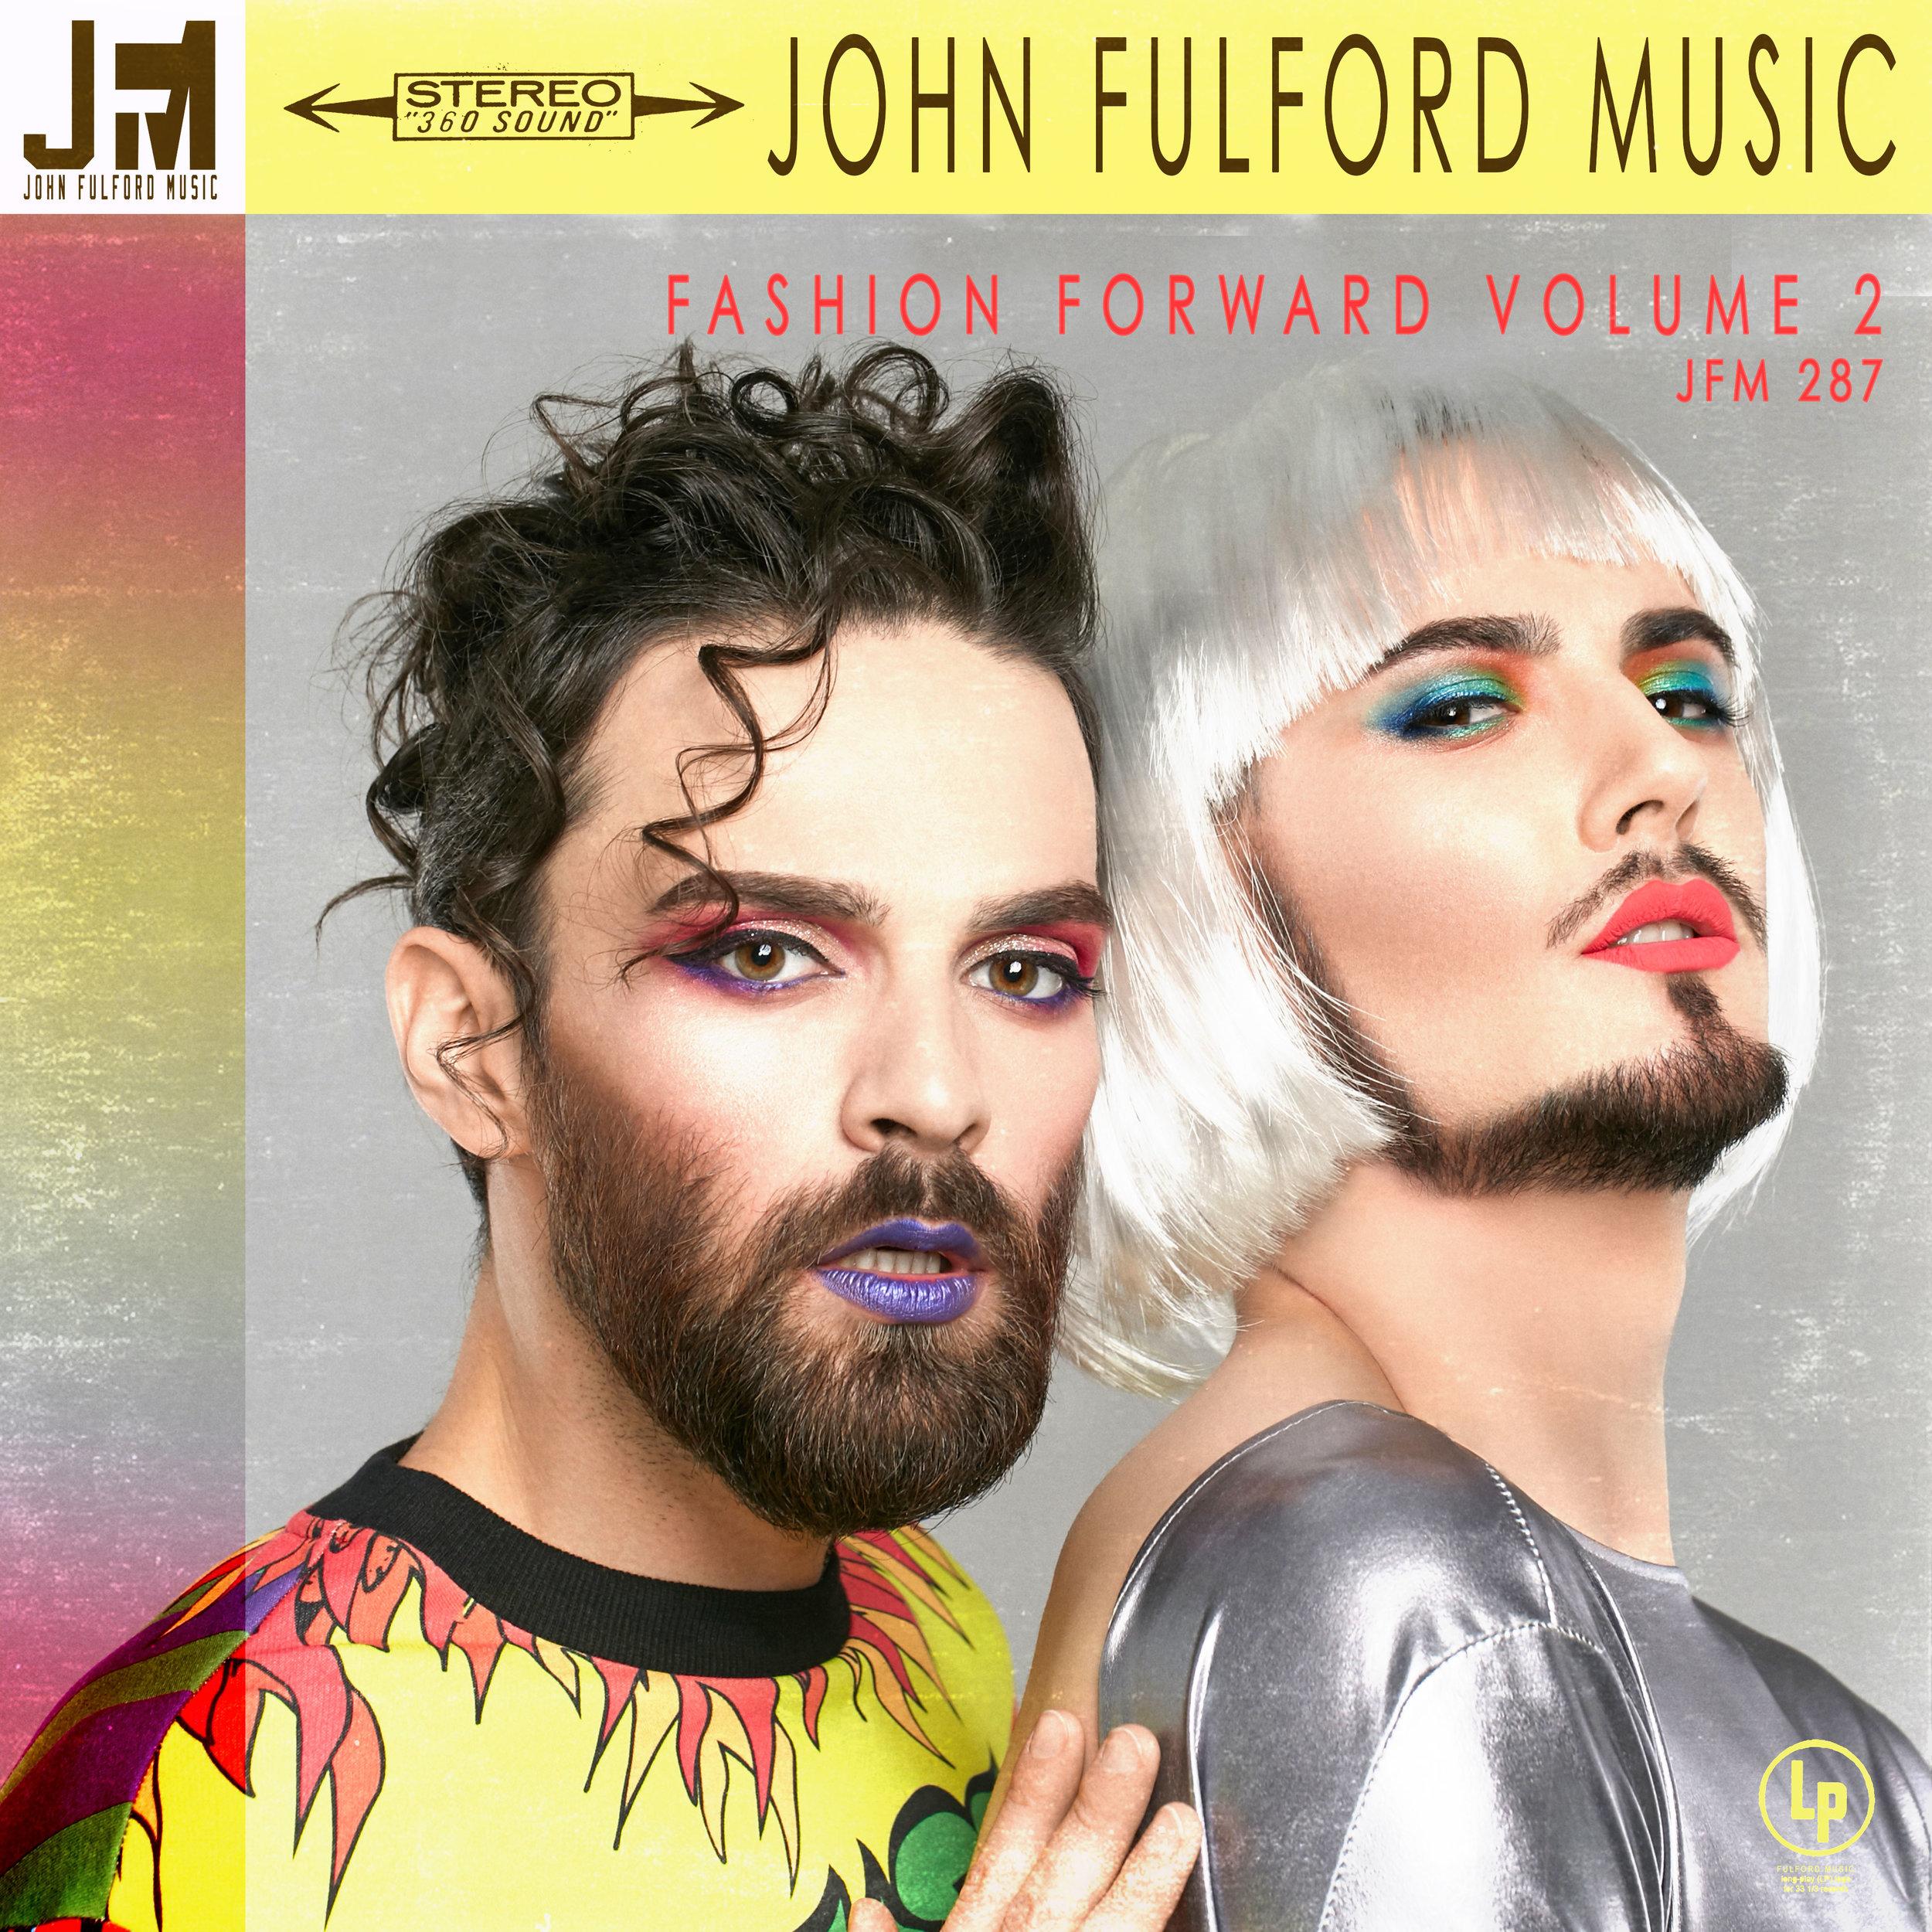 FULFORD-JFM287-Fashion-Forward-Volume-2.jpg